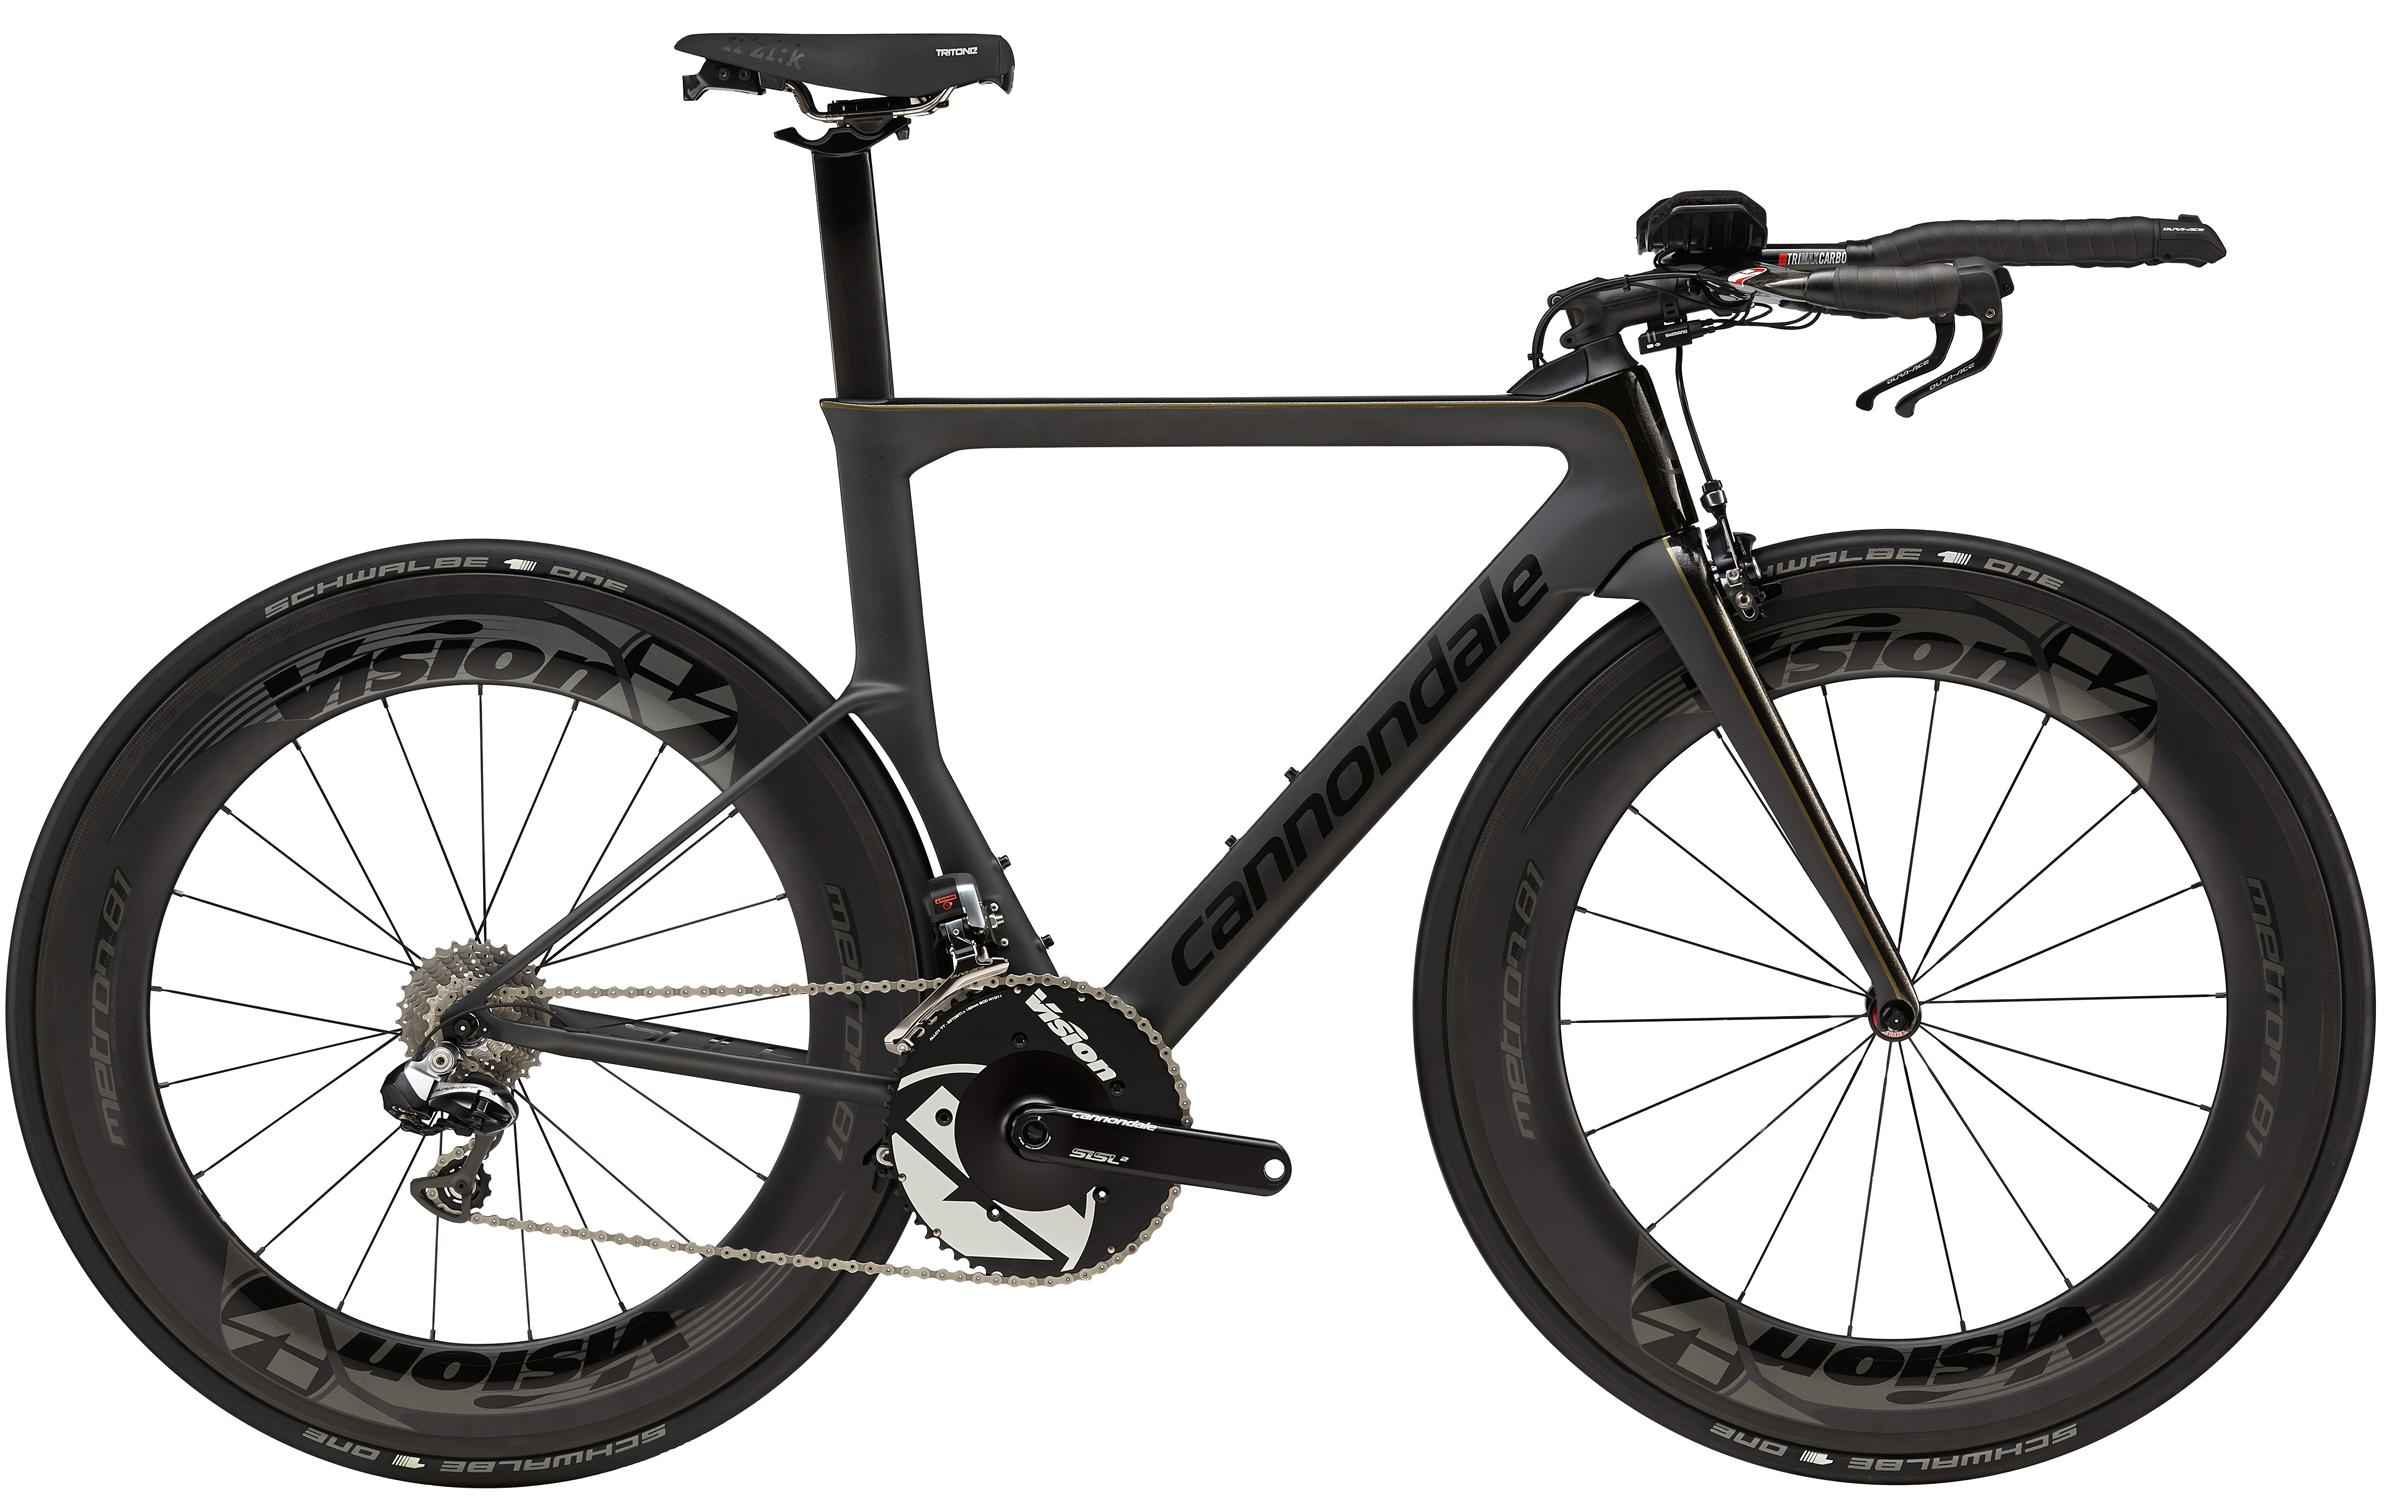 c3a52c30c9f Cannondale Slice Black Inc. - Crofton Bike Doctor - Gambrills MD